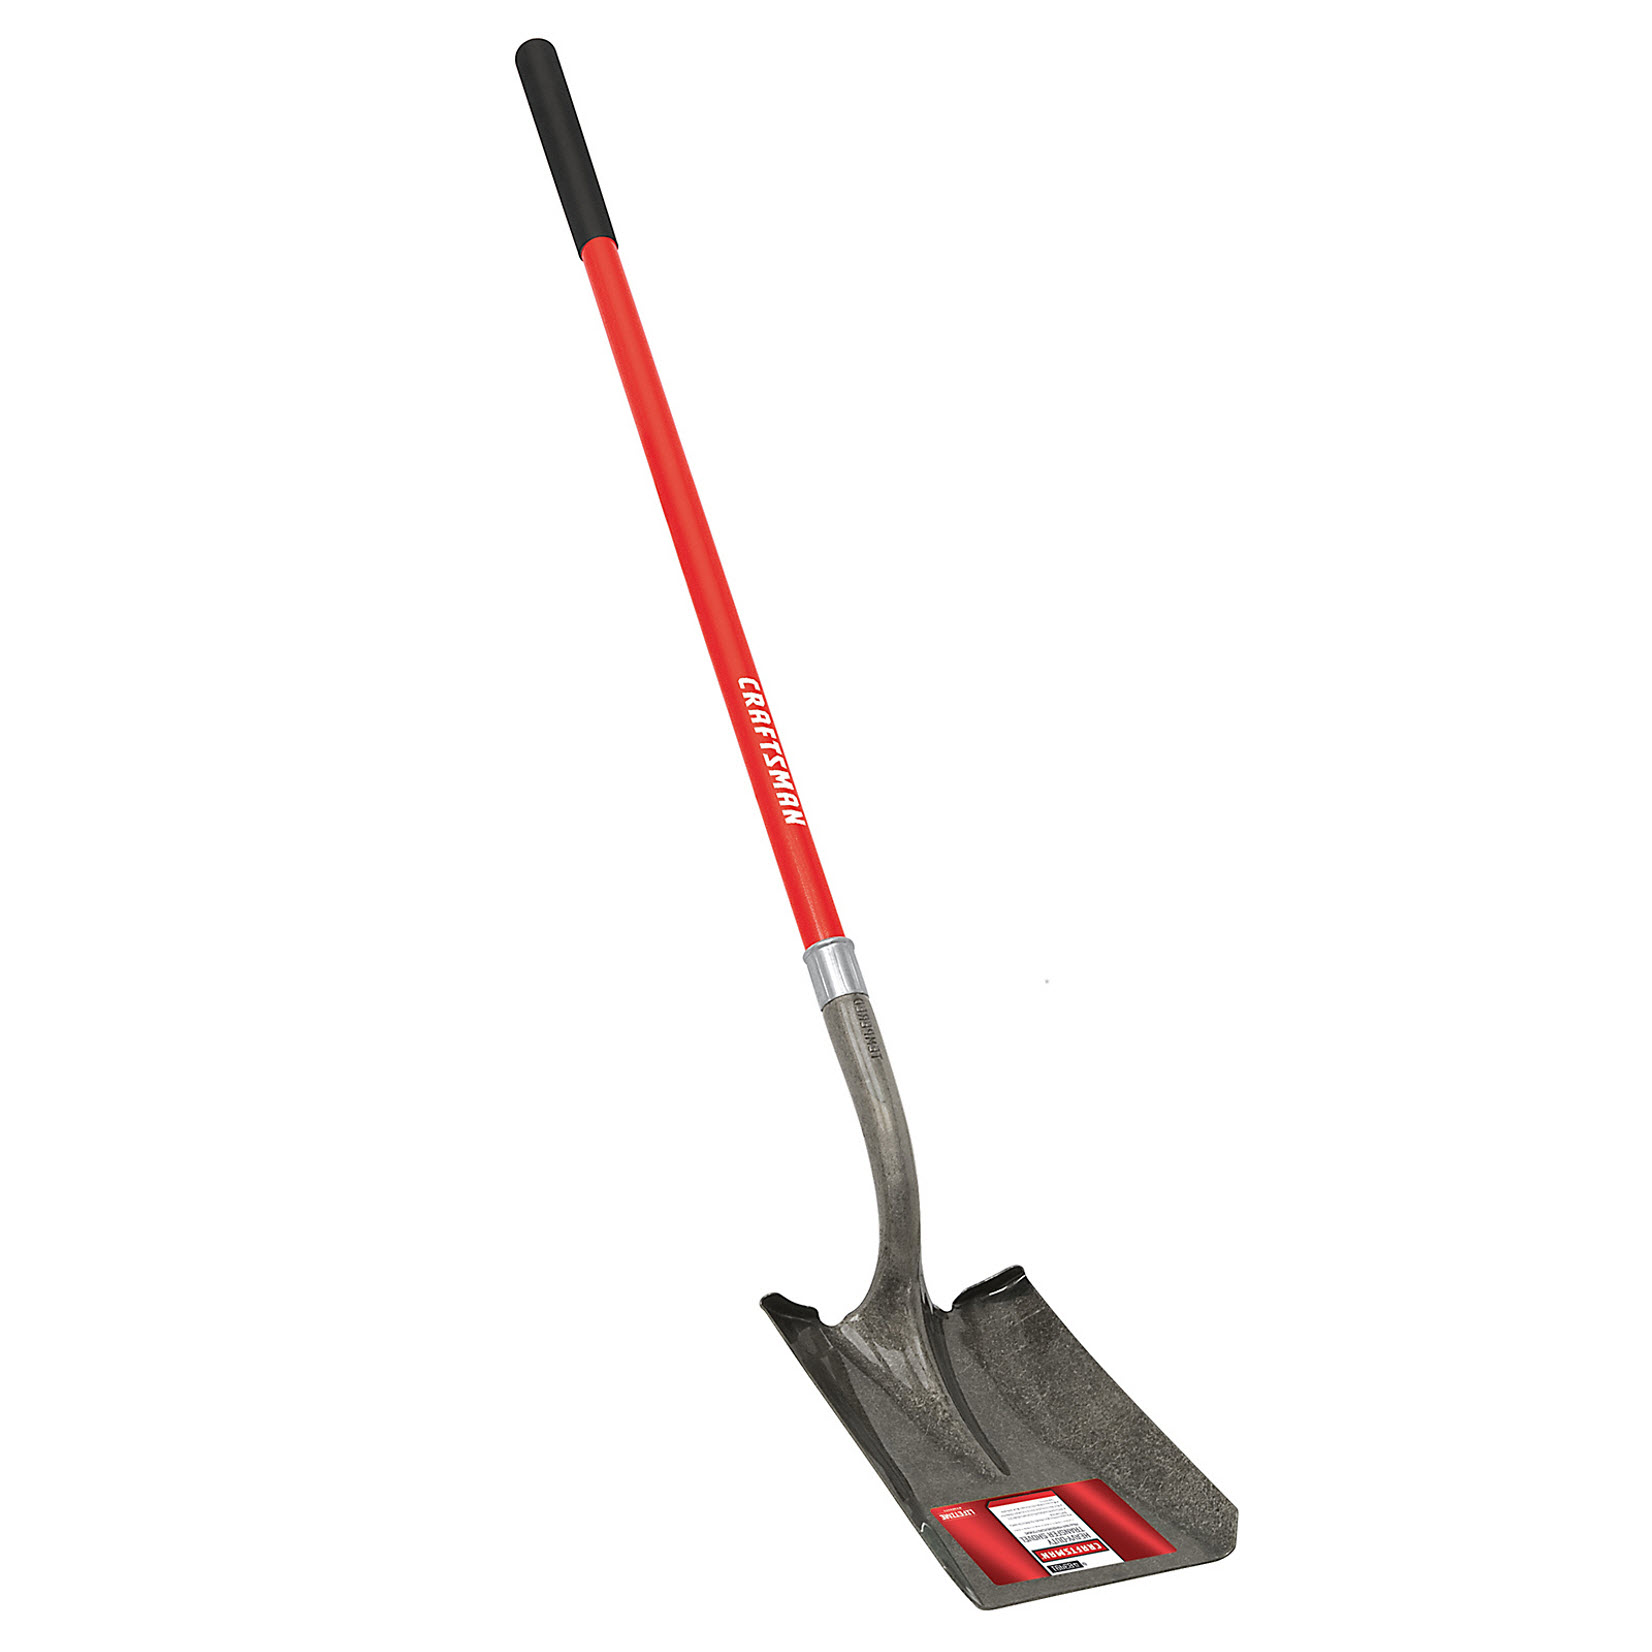 Craftsman LHSP Shovel w/Fiberglass Handle